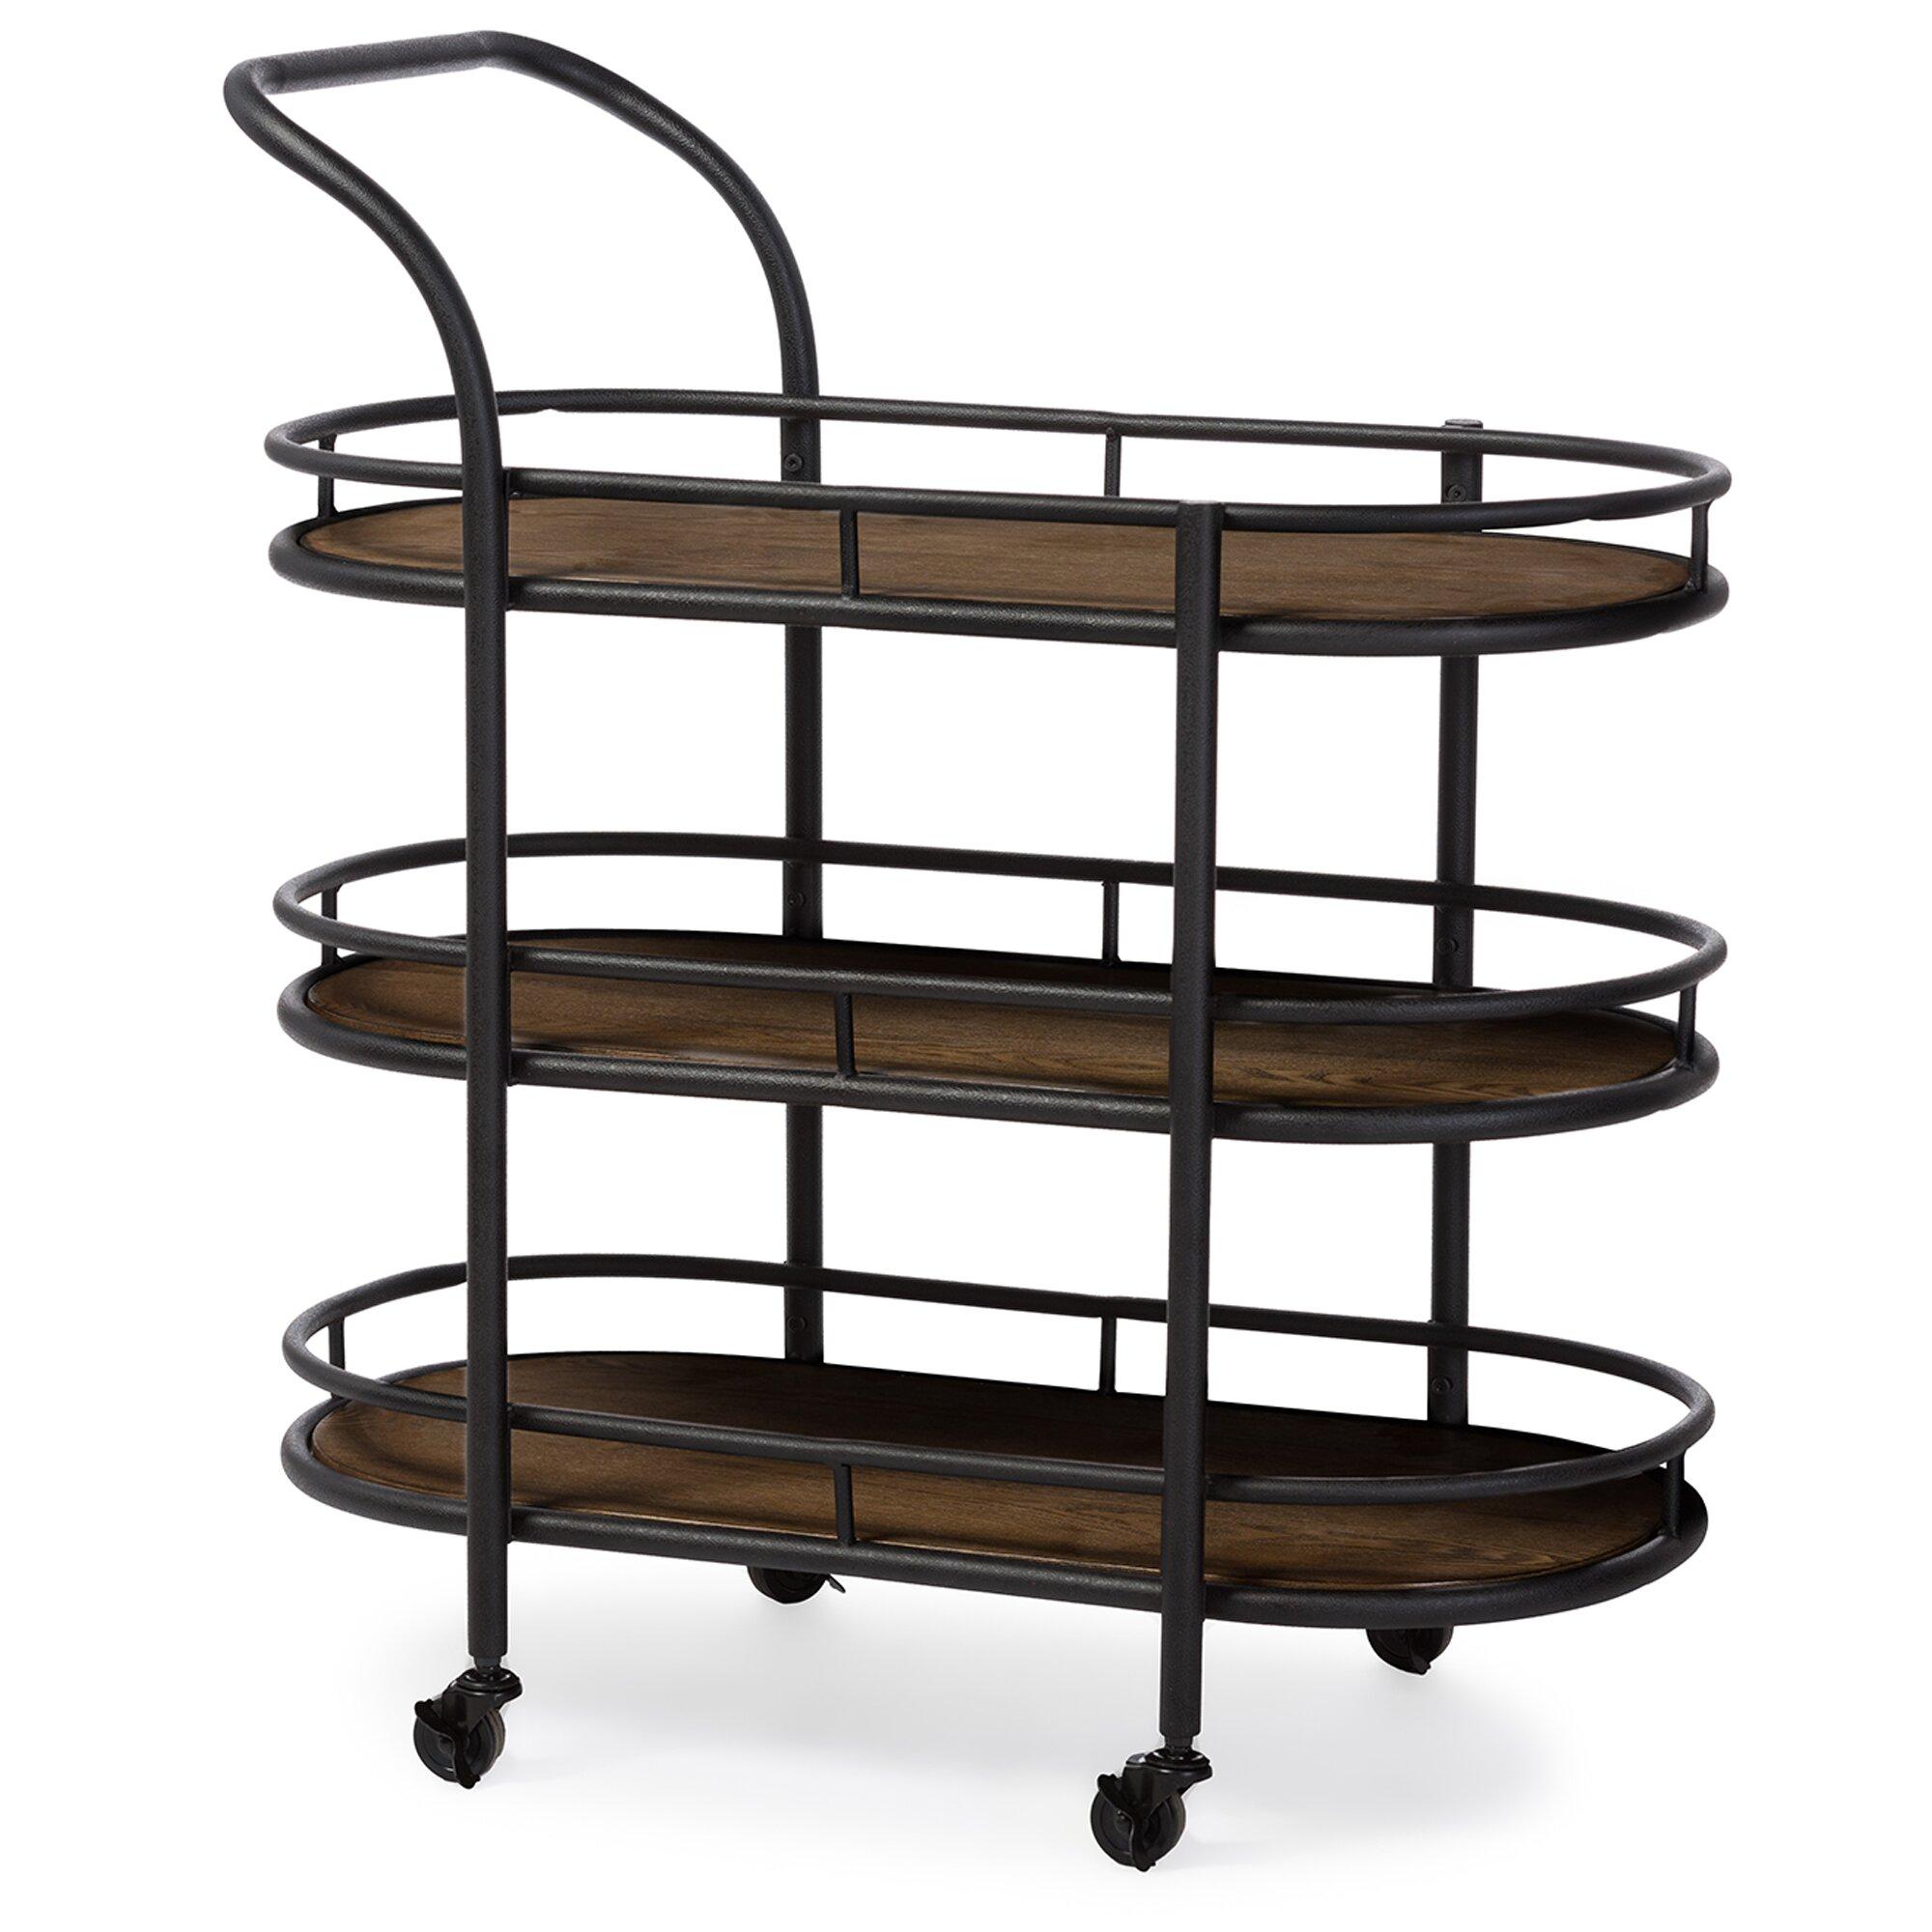 Wholesale Dining Room Sets Wholesale Interiors Baxton Studio Karlin Serving Cart